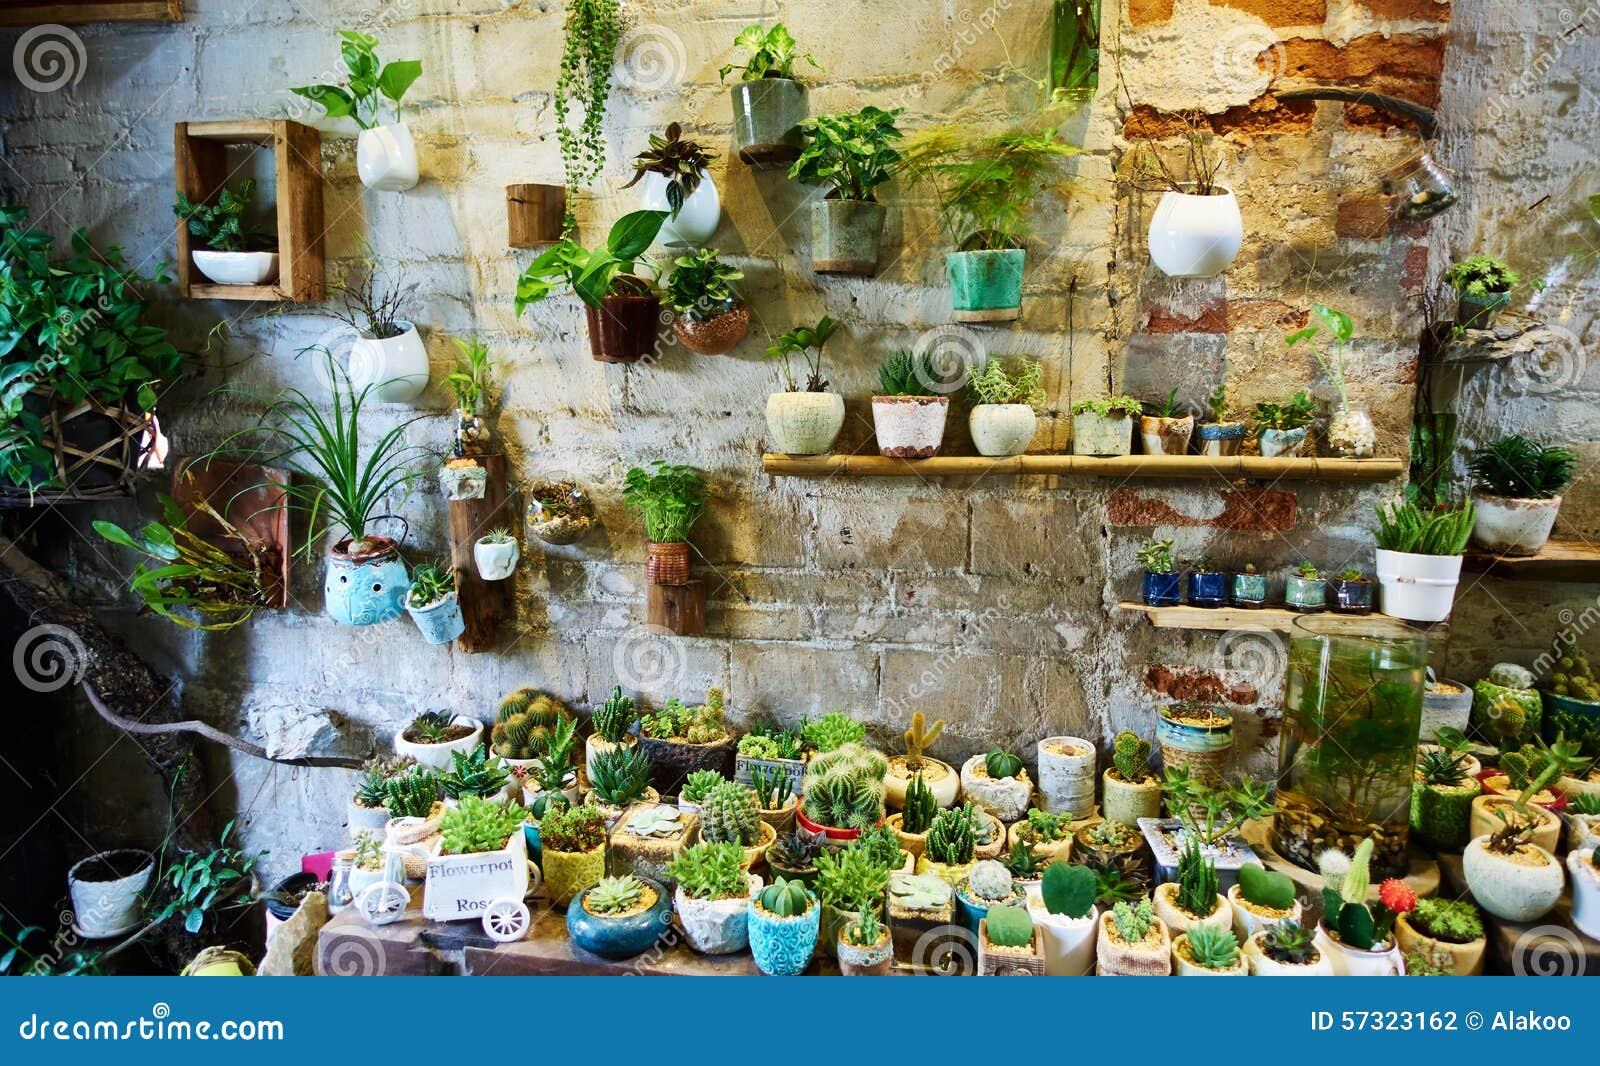 Flower Shop Stock Photo - Image: 57323162